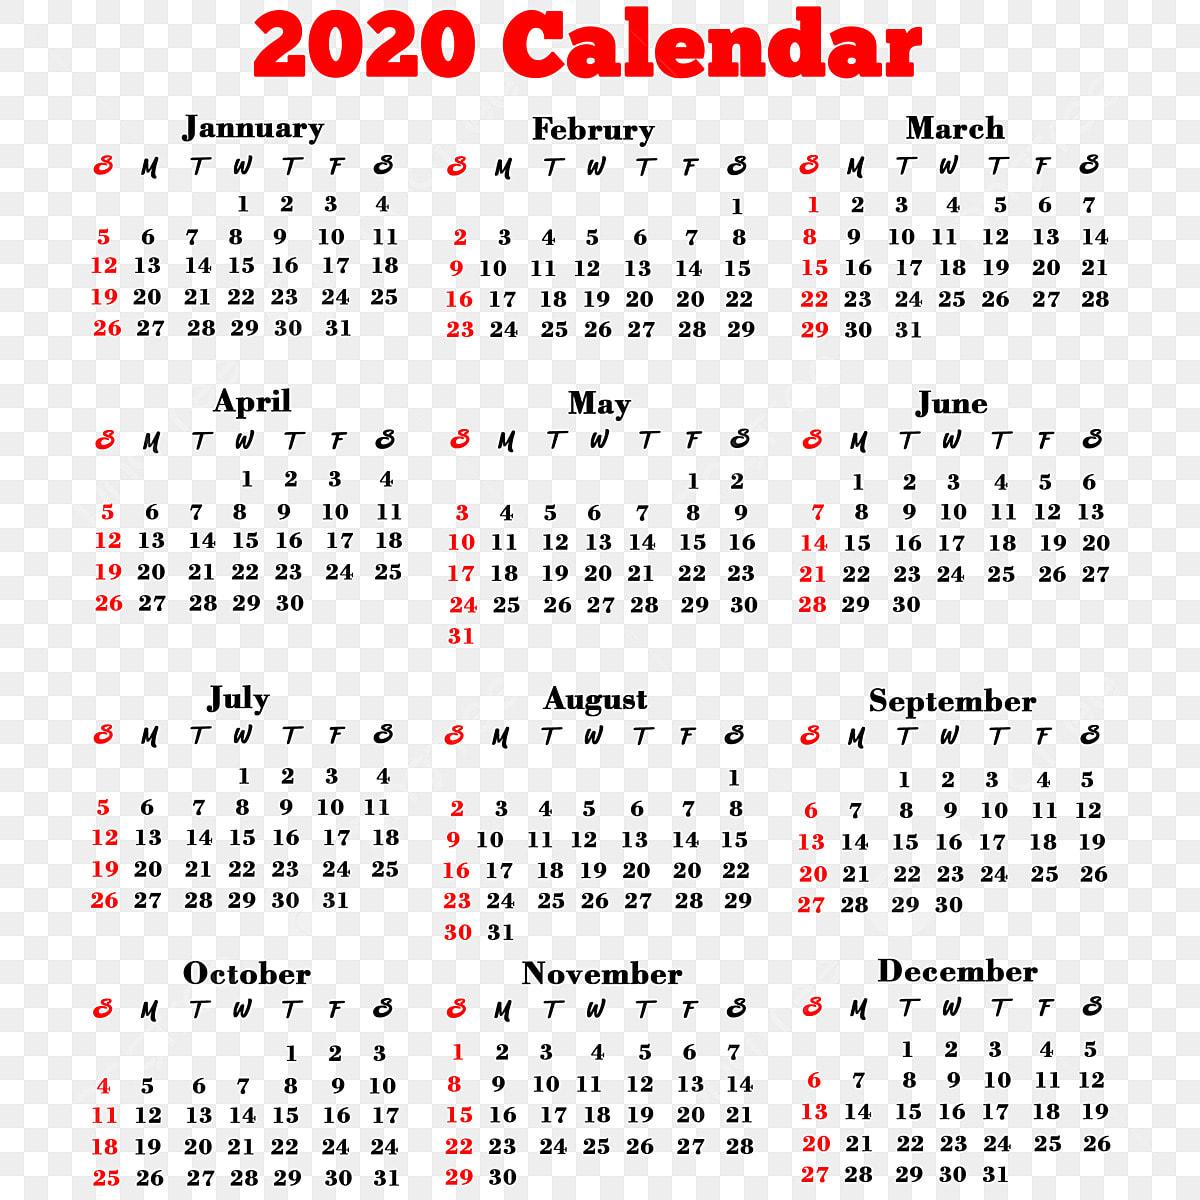 2020 Calendar Png, 2020 Calendar, 2020, Calendar PNG